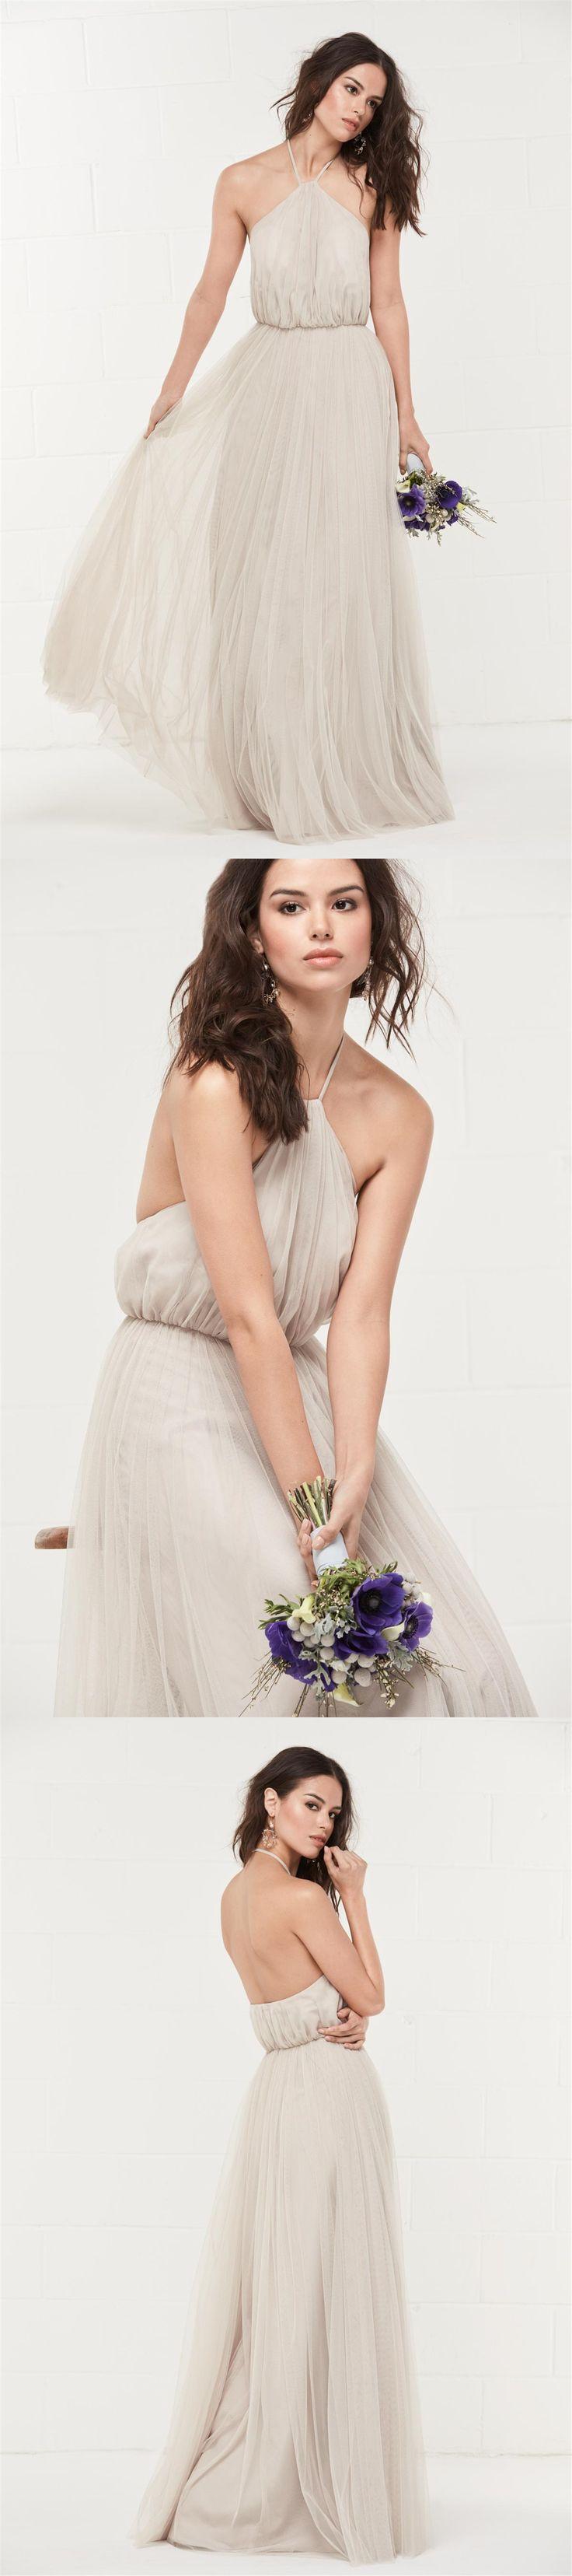 Long Bridesmaid Dress, Halter Bridesmaid Dress, Tulle Bridesmaid Dress, Dress for Wedding, Floor-Length Bridesmaid Dress, Backless Bridesmaid Dress, A-Line Bridesmaid Dress